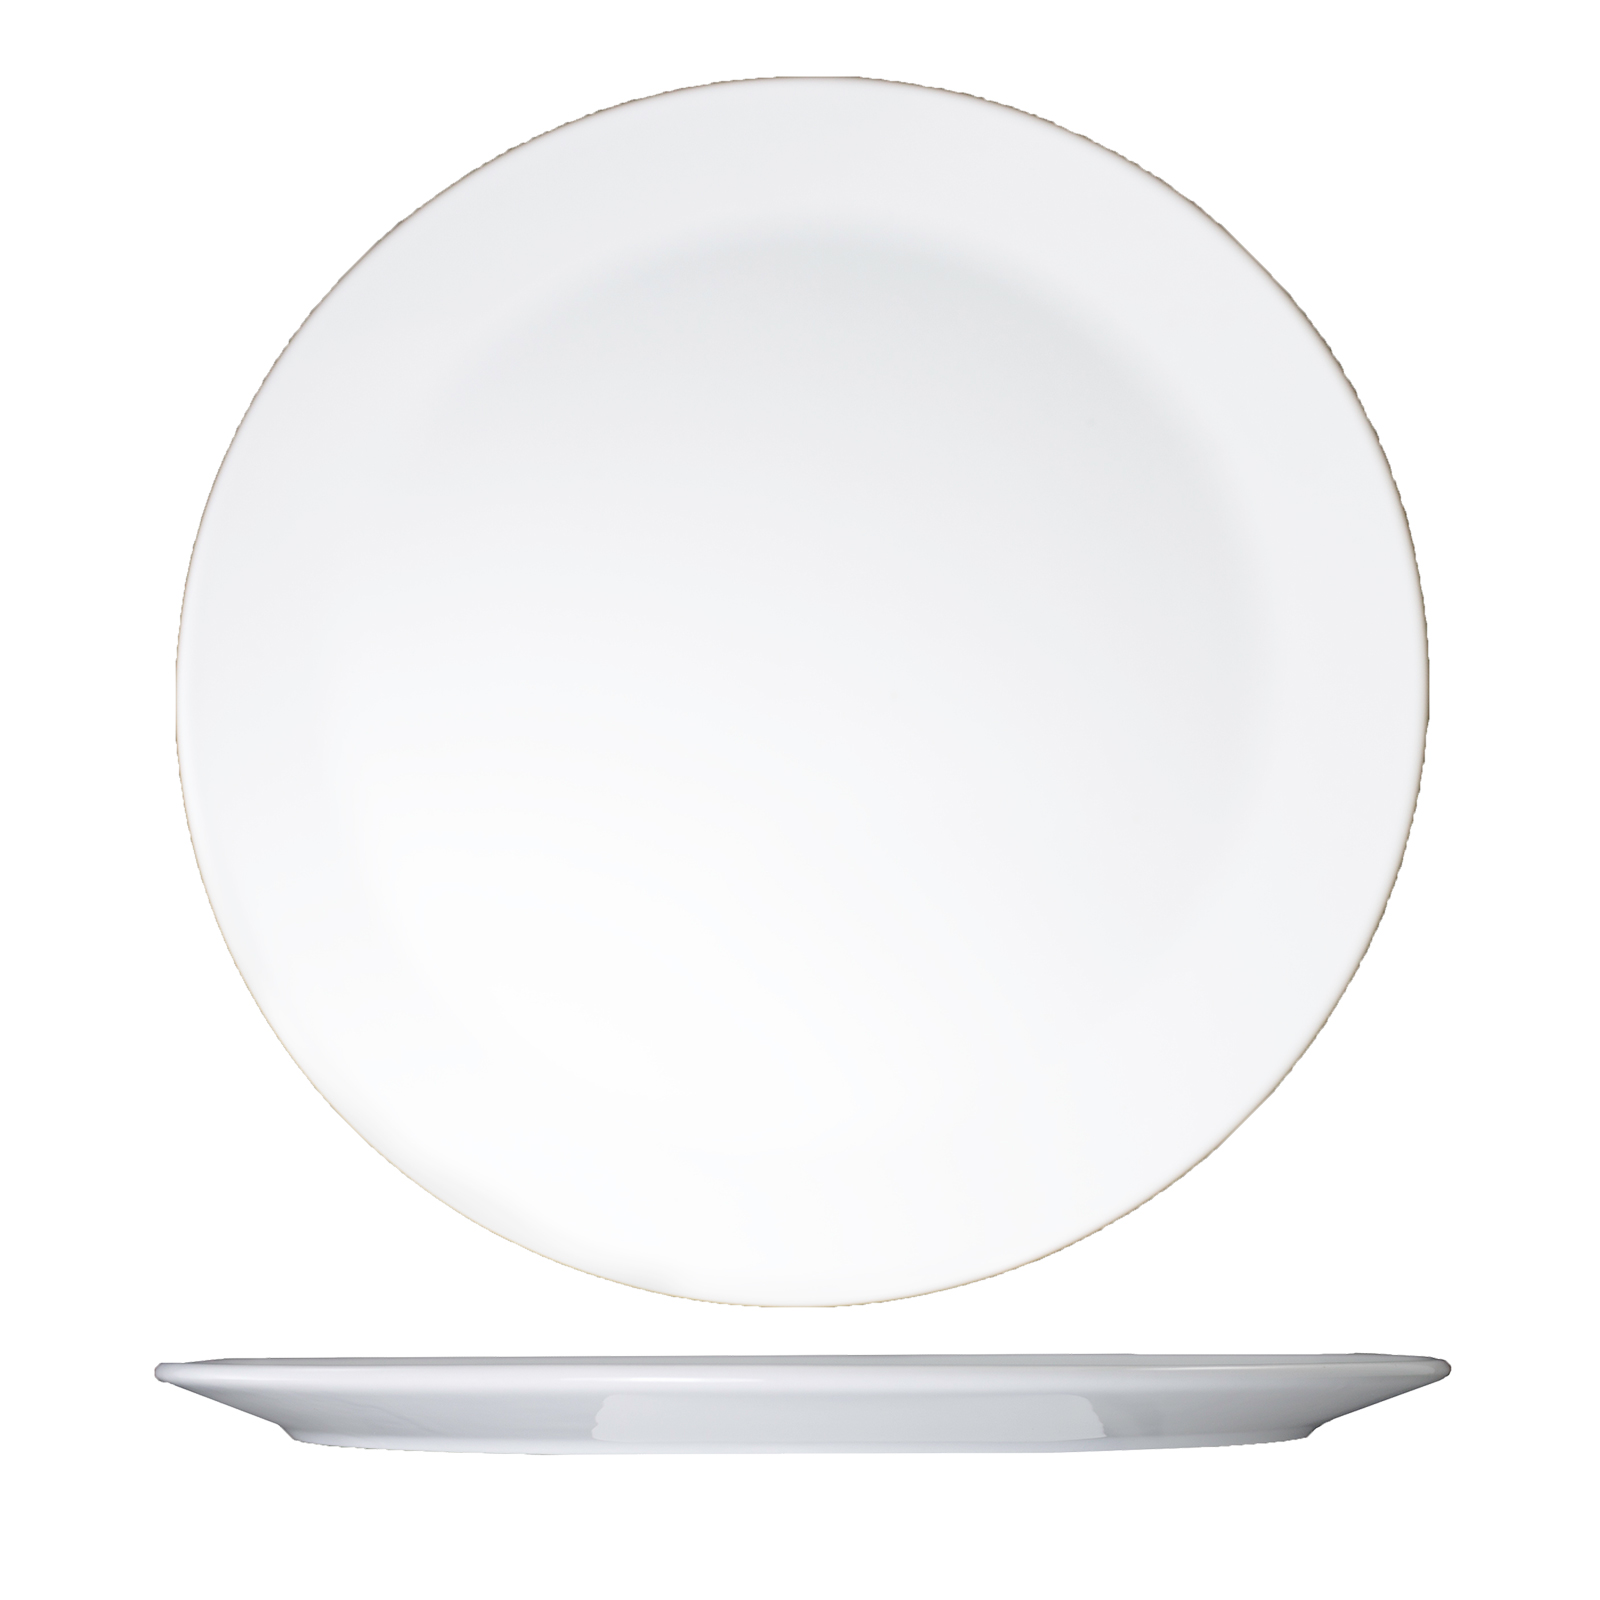 International Tableware PL-100 plate, china